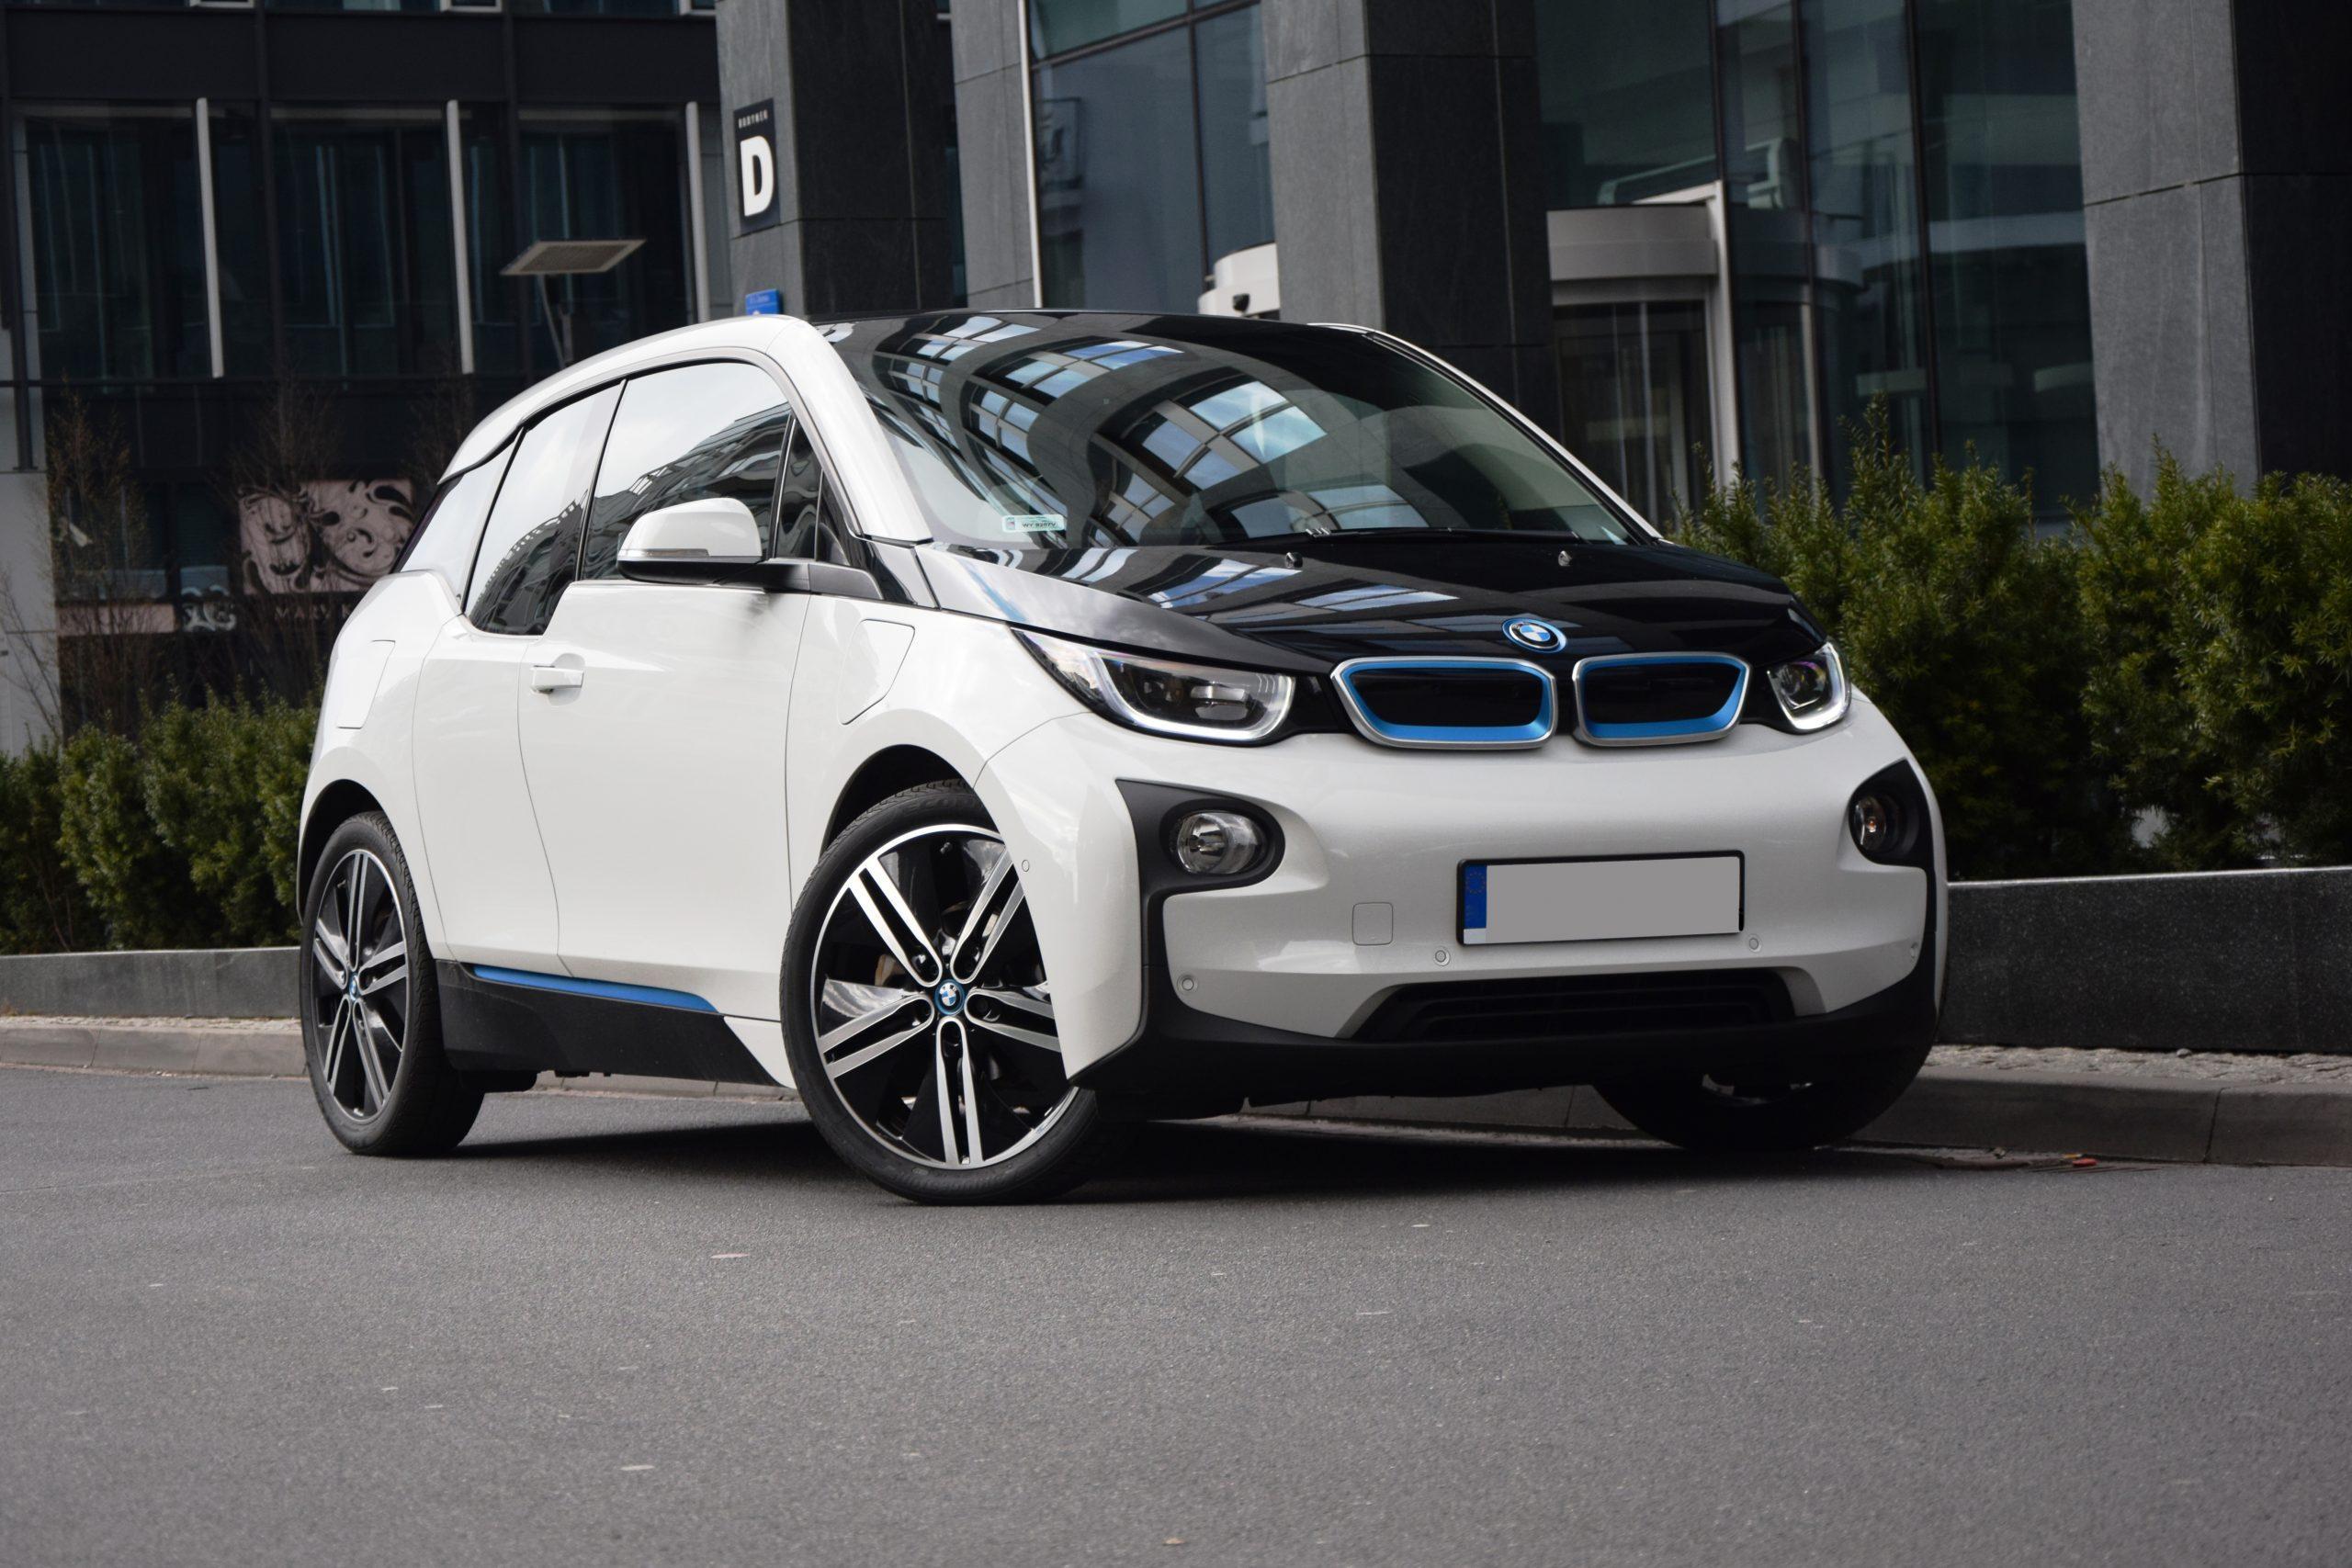 Borne de recharge BMW i3